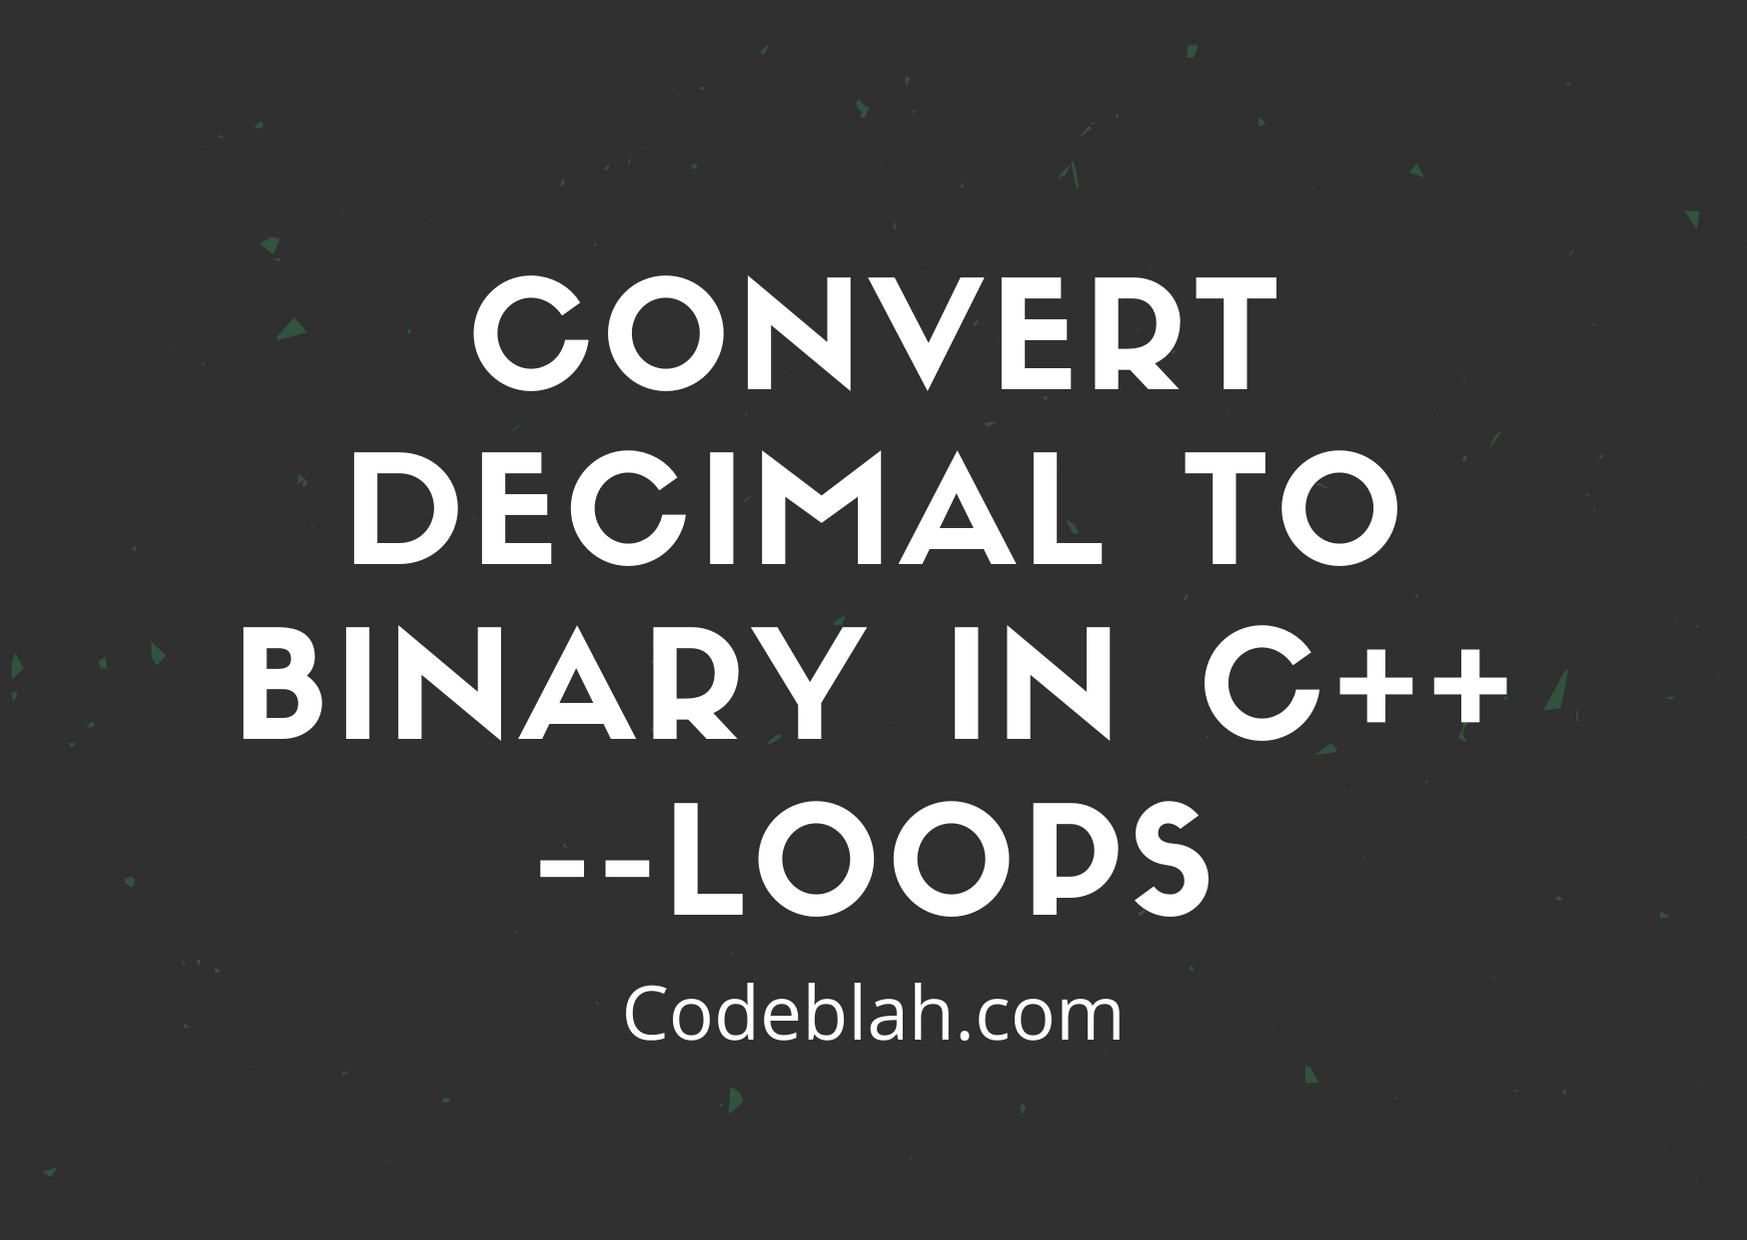 C++ Program to Convert Decimal to Binary